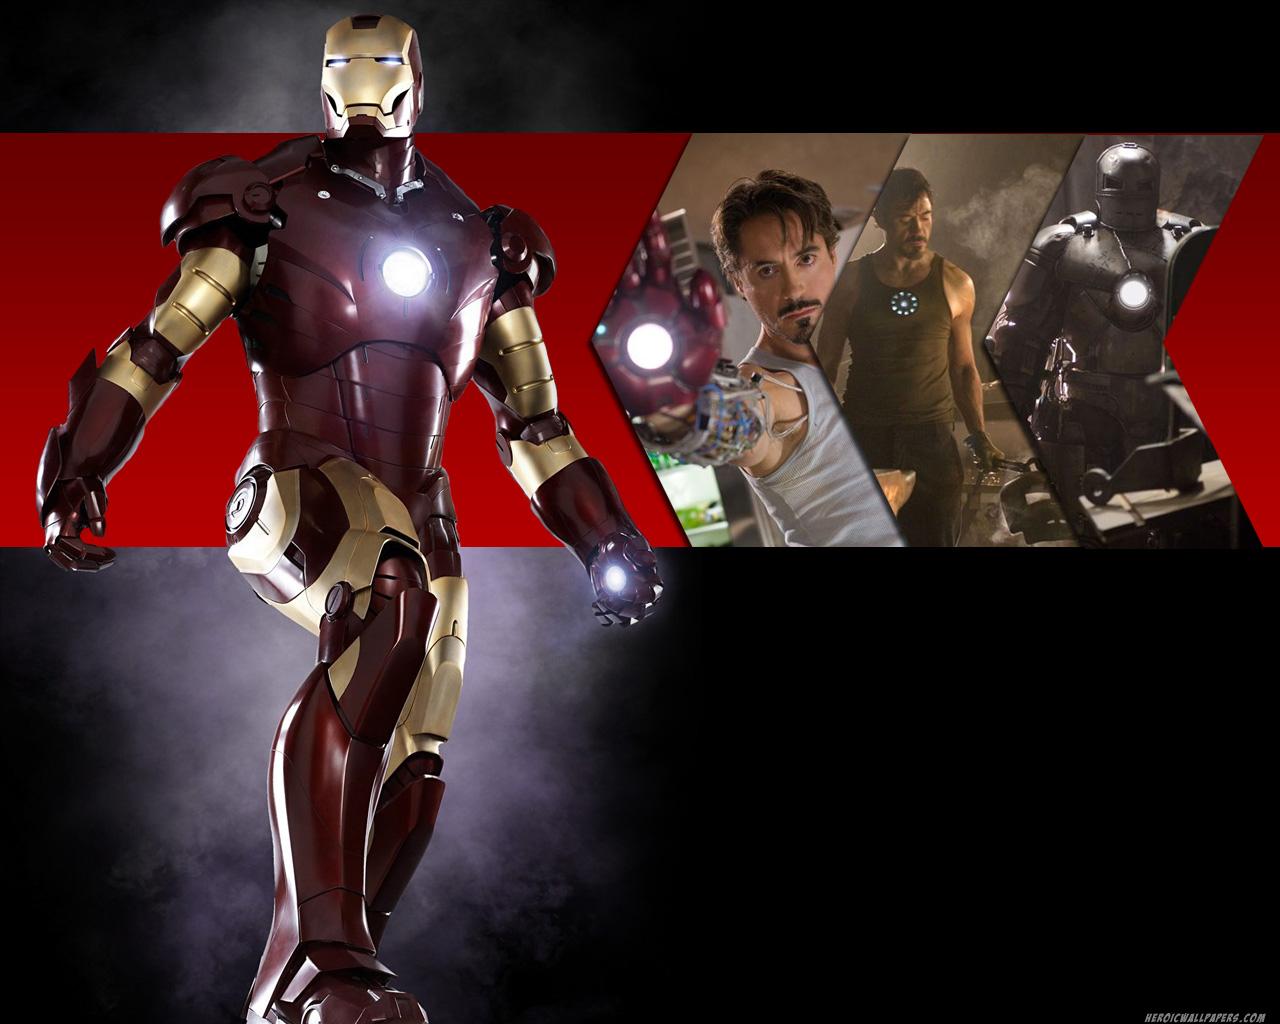 iron-man-movie-wallpaper.jpg